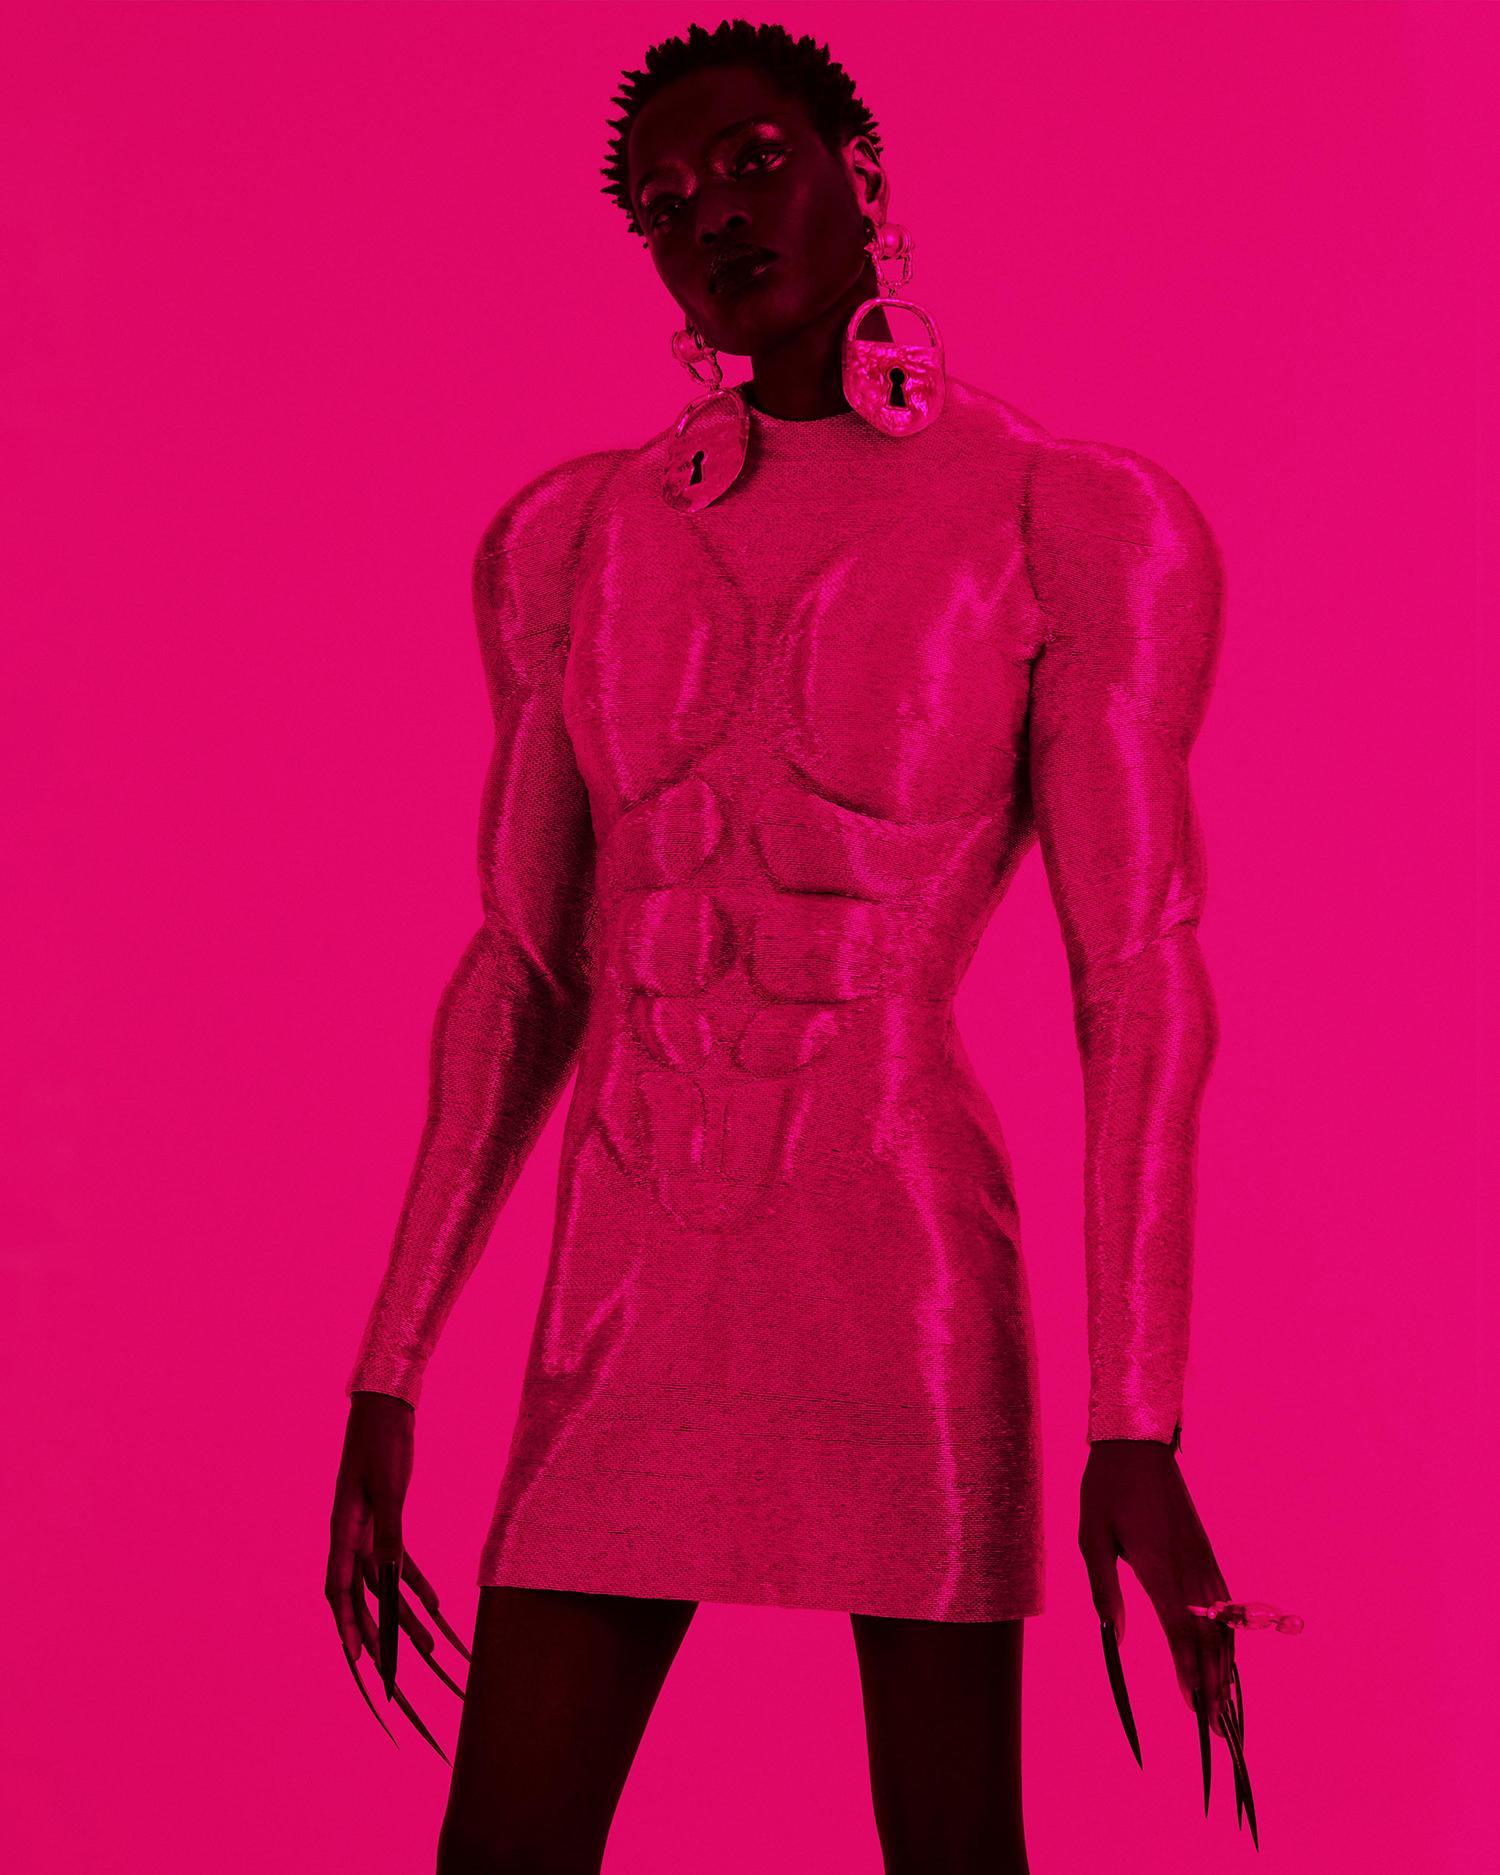 Awar Odhiang by Constantin Schlachter for Numéro Netherlands Spring Summer 2021